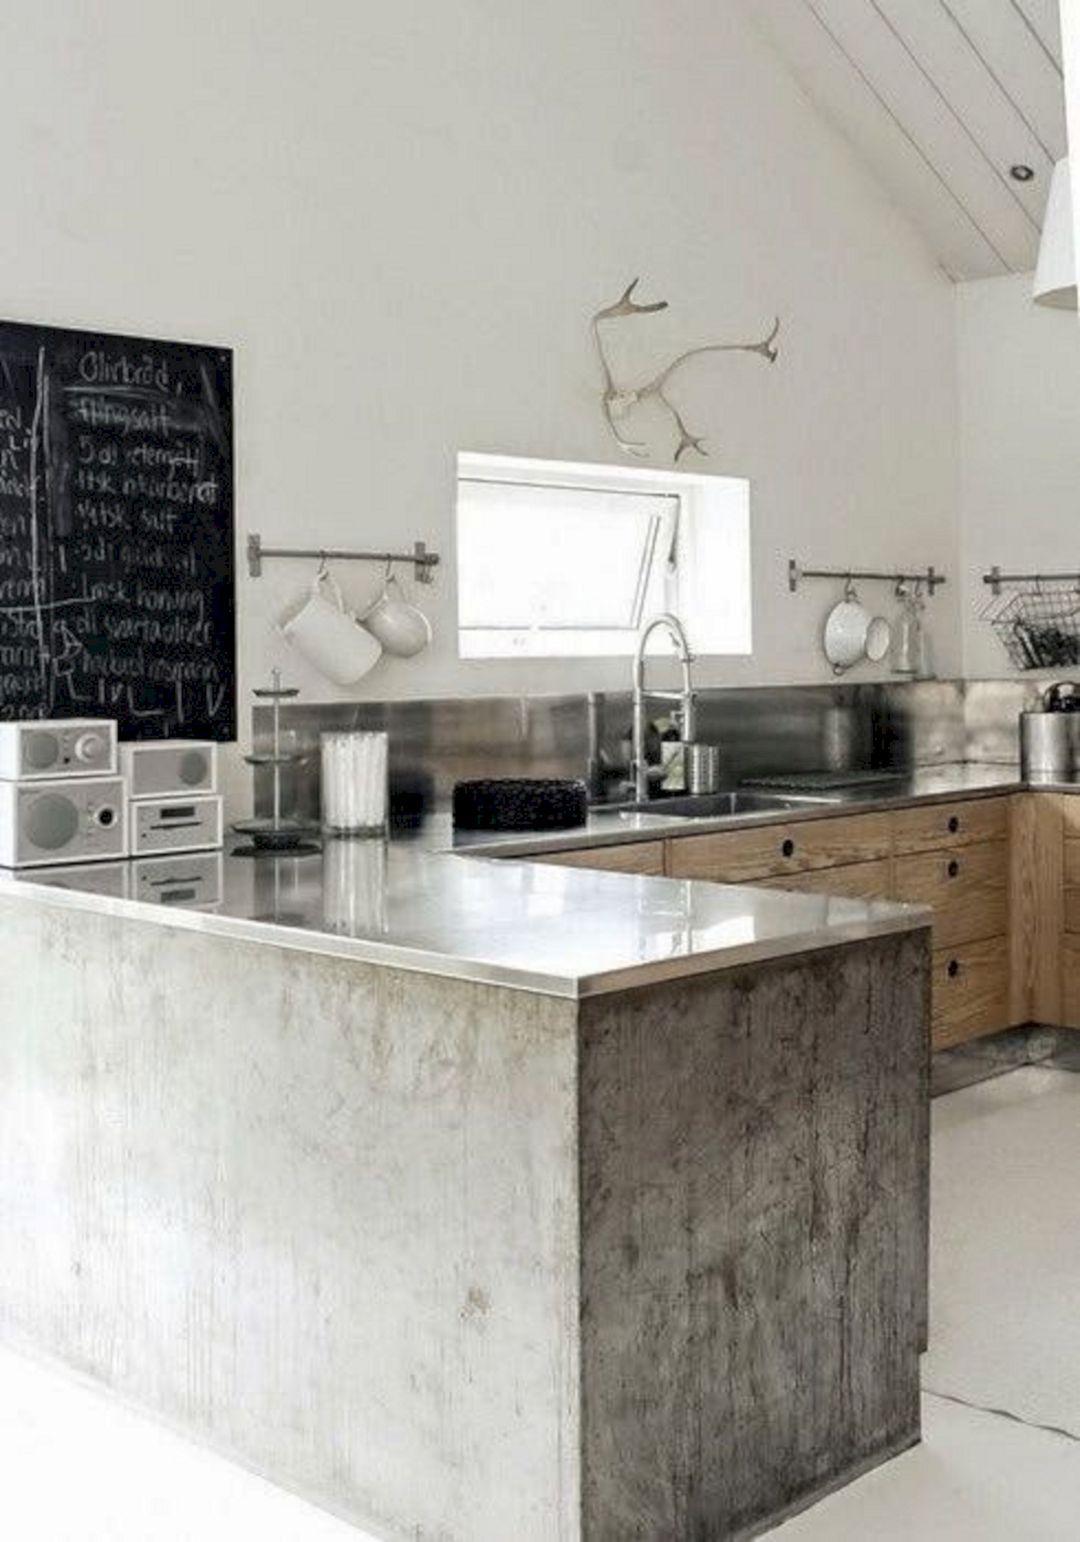 Outstanding best kitchen decor collection ideas modern farmhouse